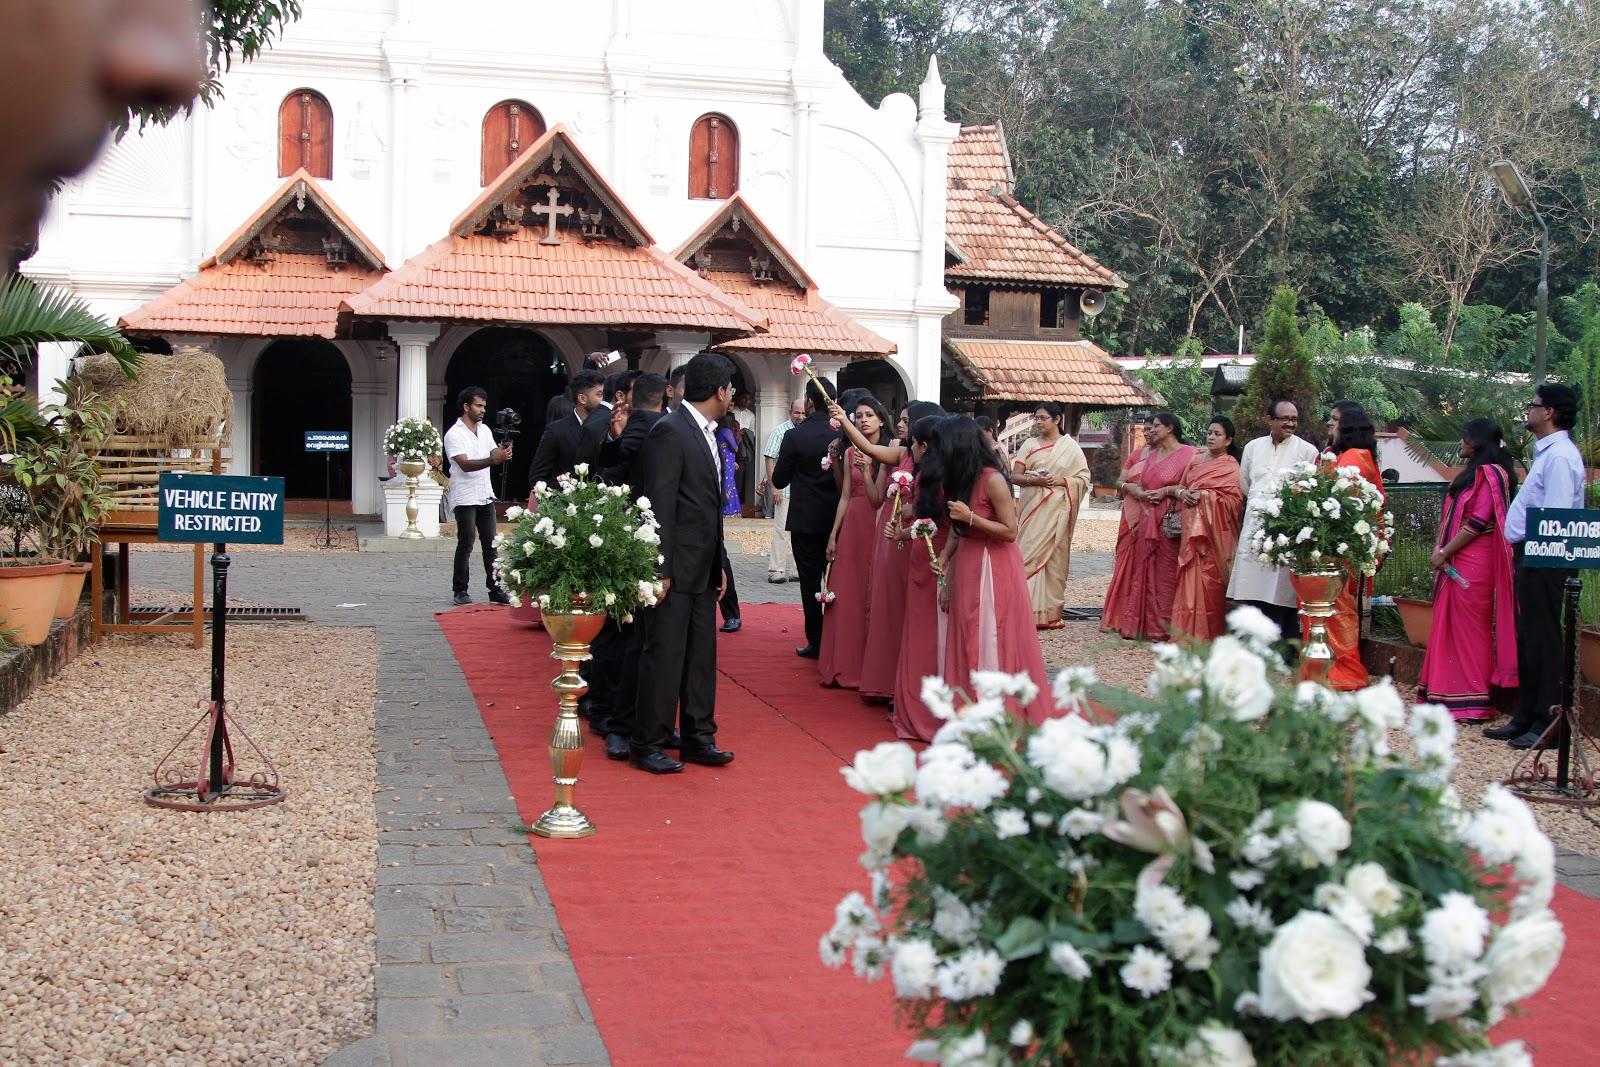 Christian wedding planner kalloopara